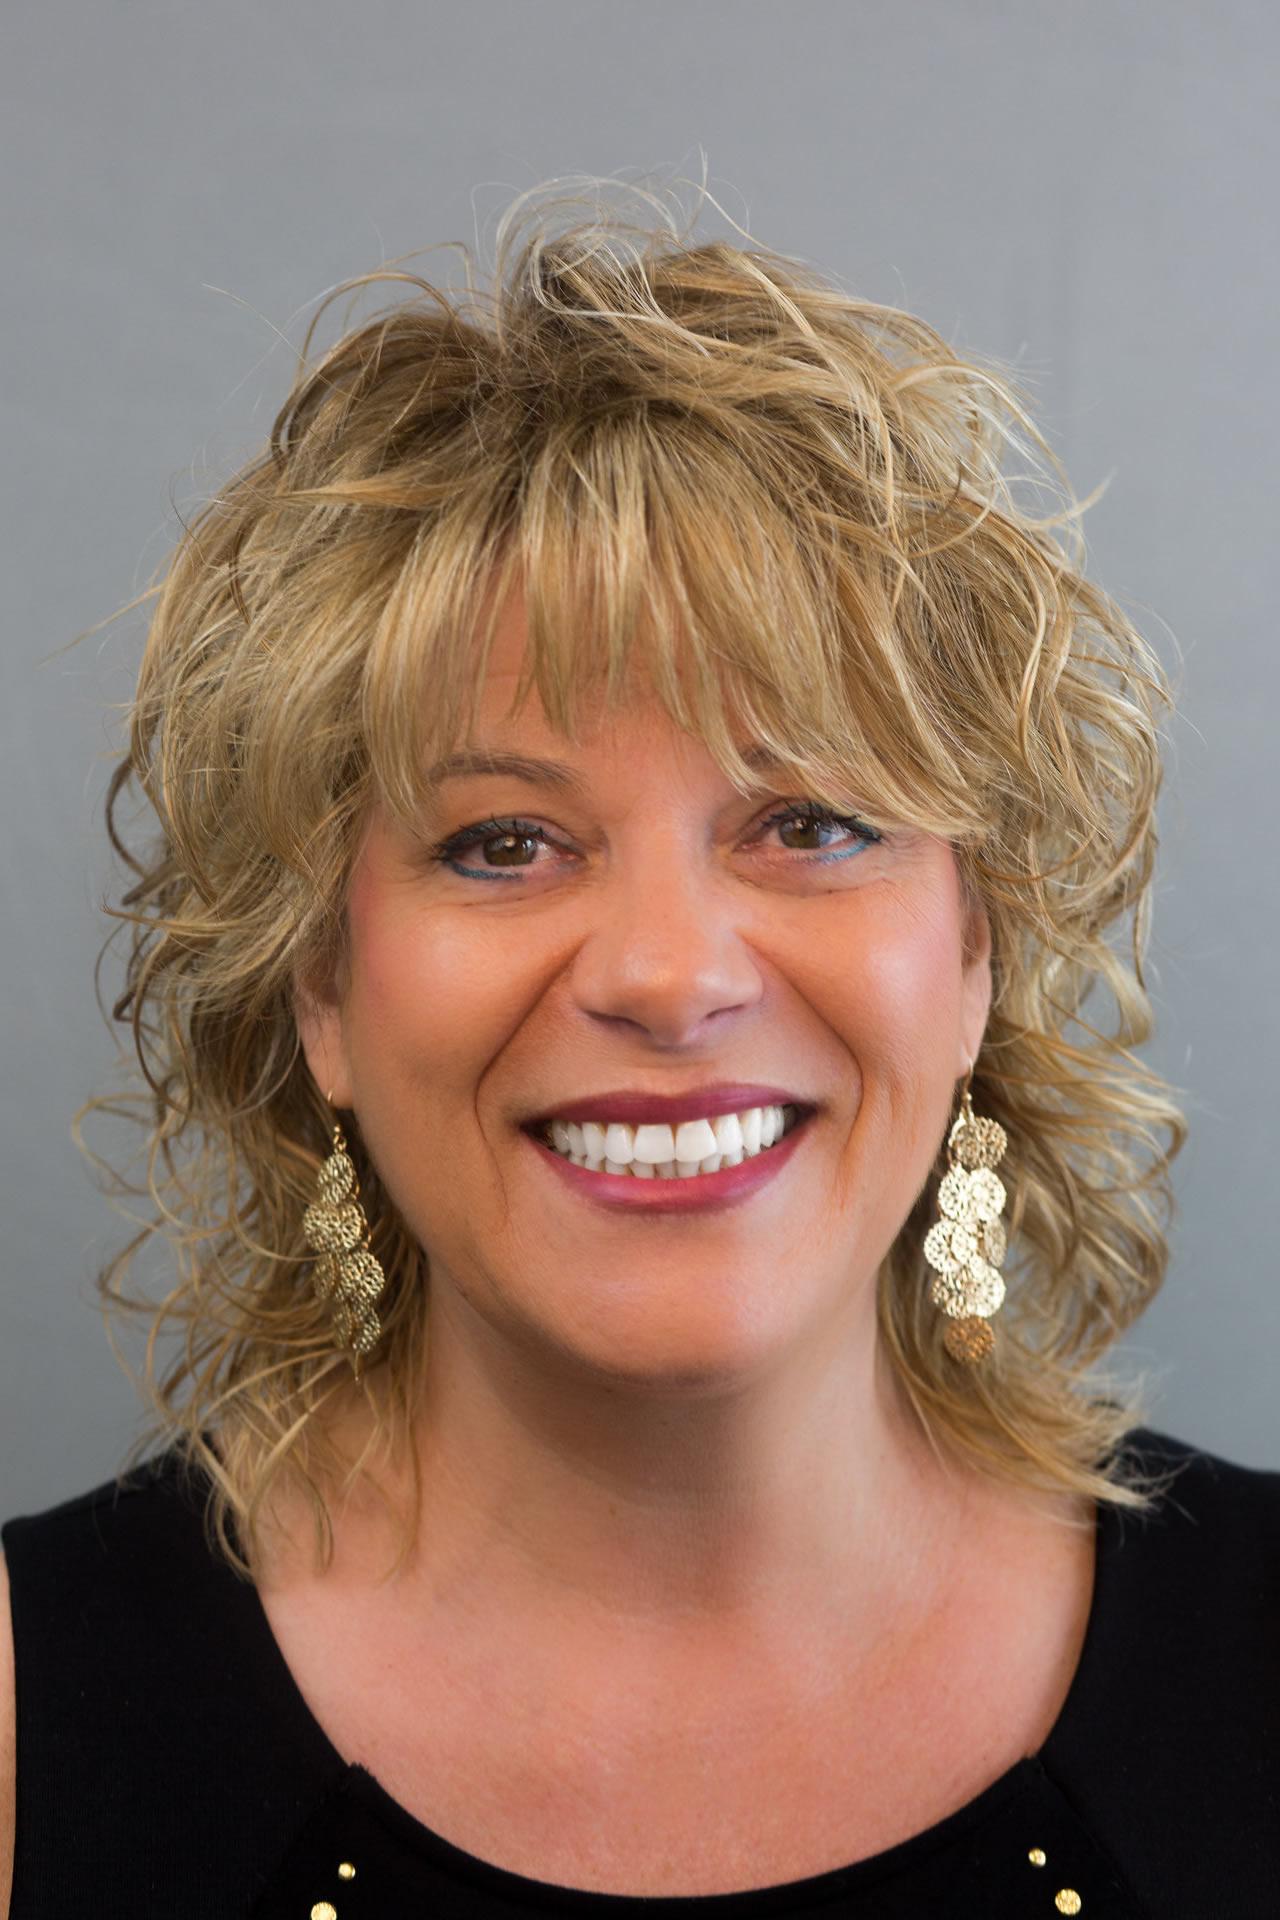 Ursula Cherry - Owner - International Look Hair Studio